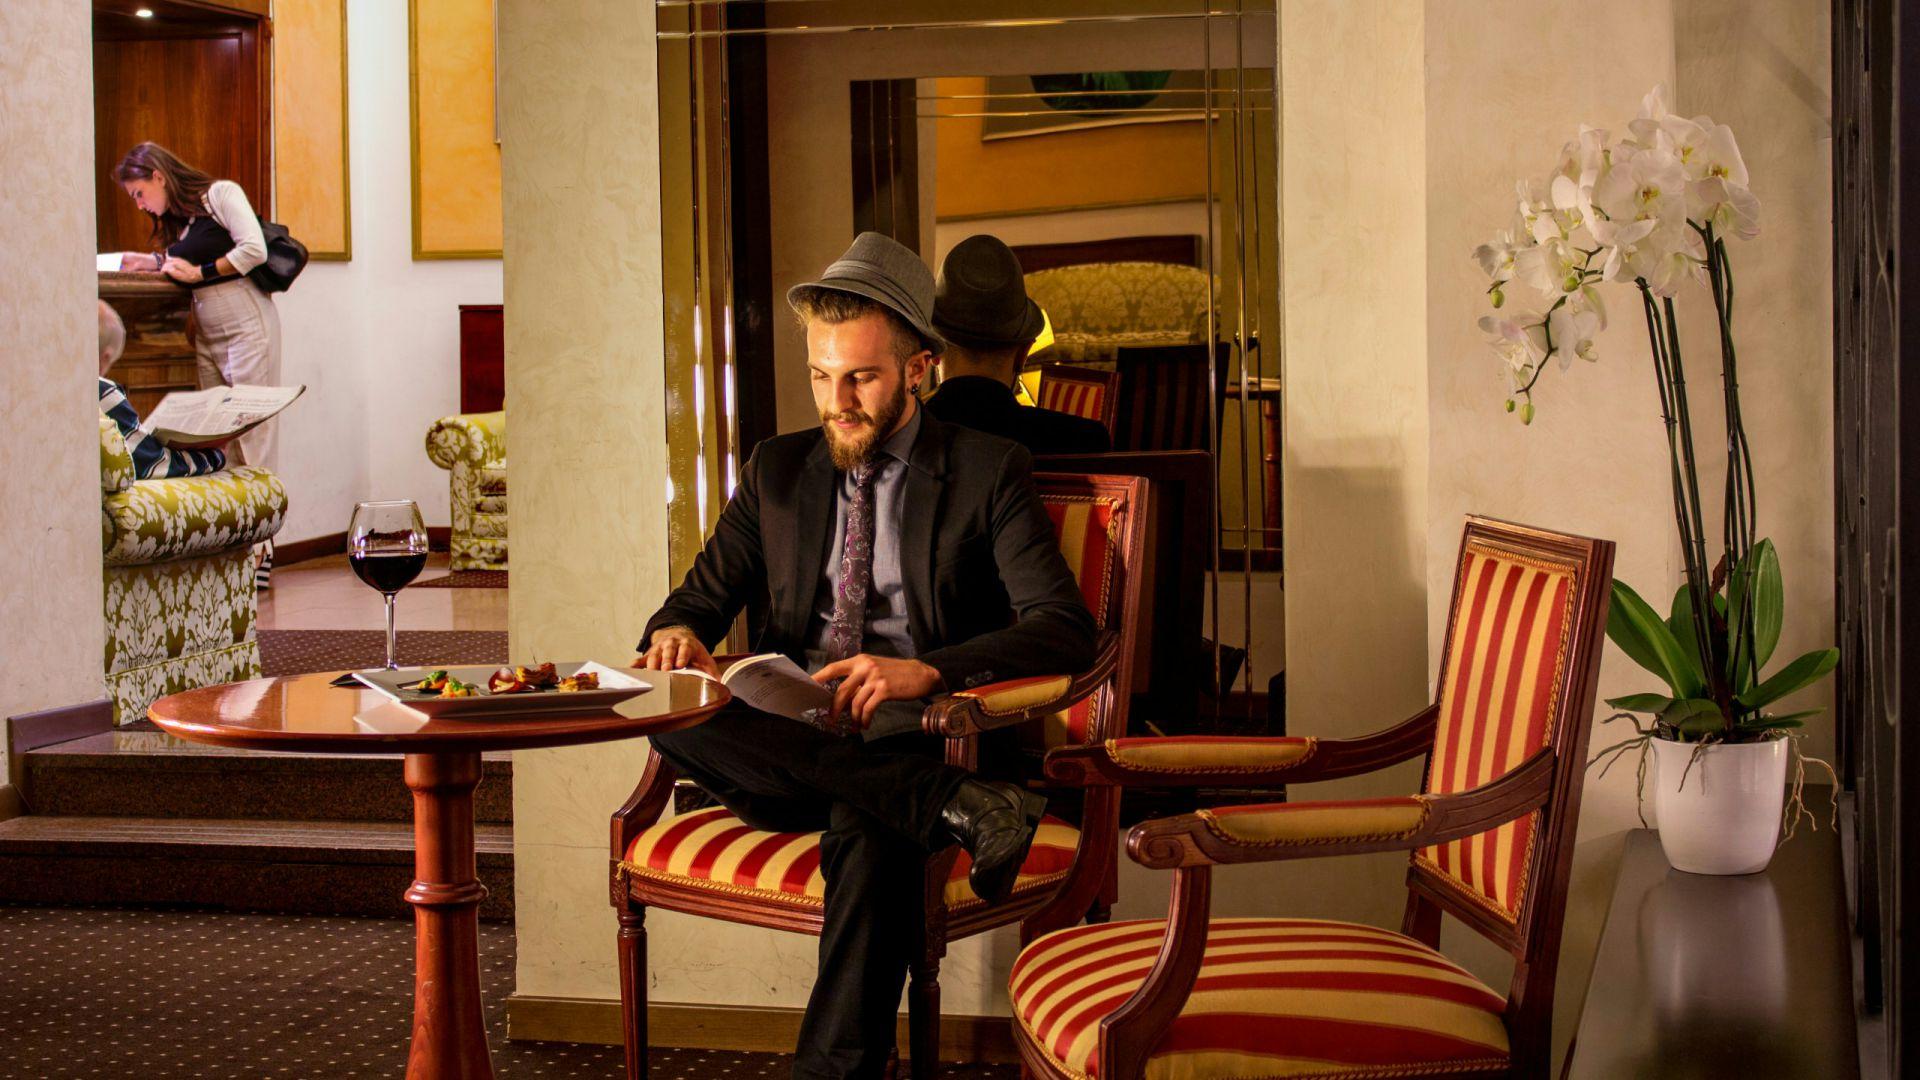 Foto-Hotel-Oxford-Roma-hóspedes-4